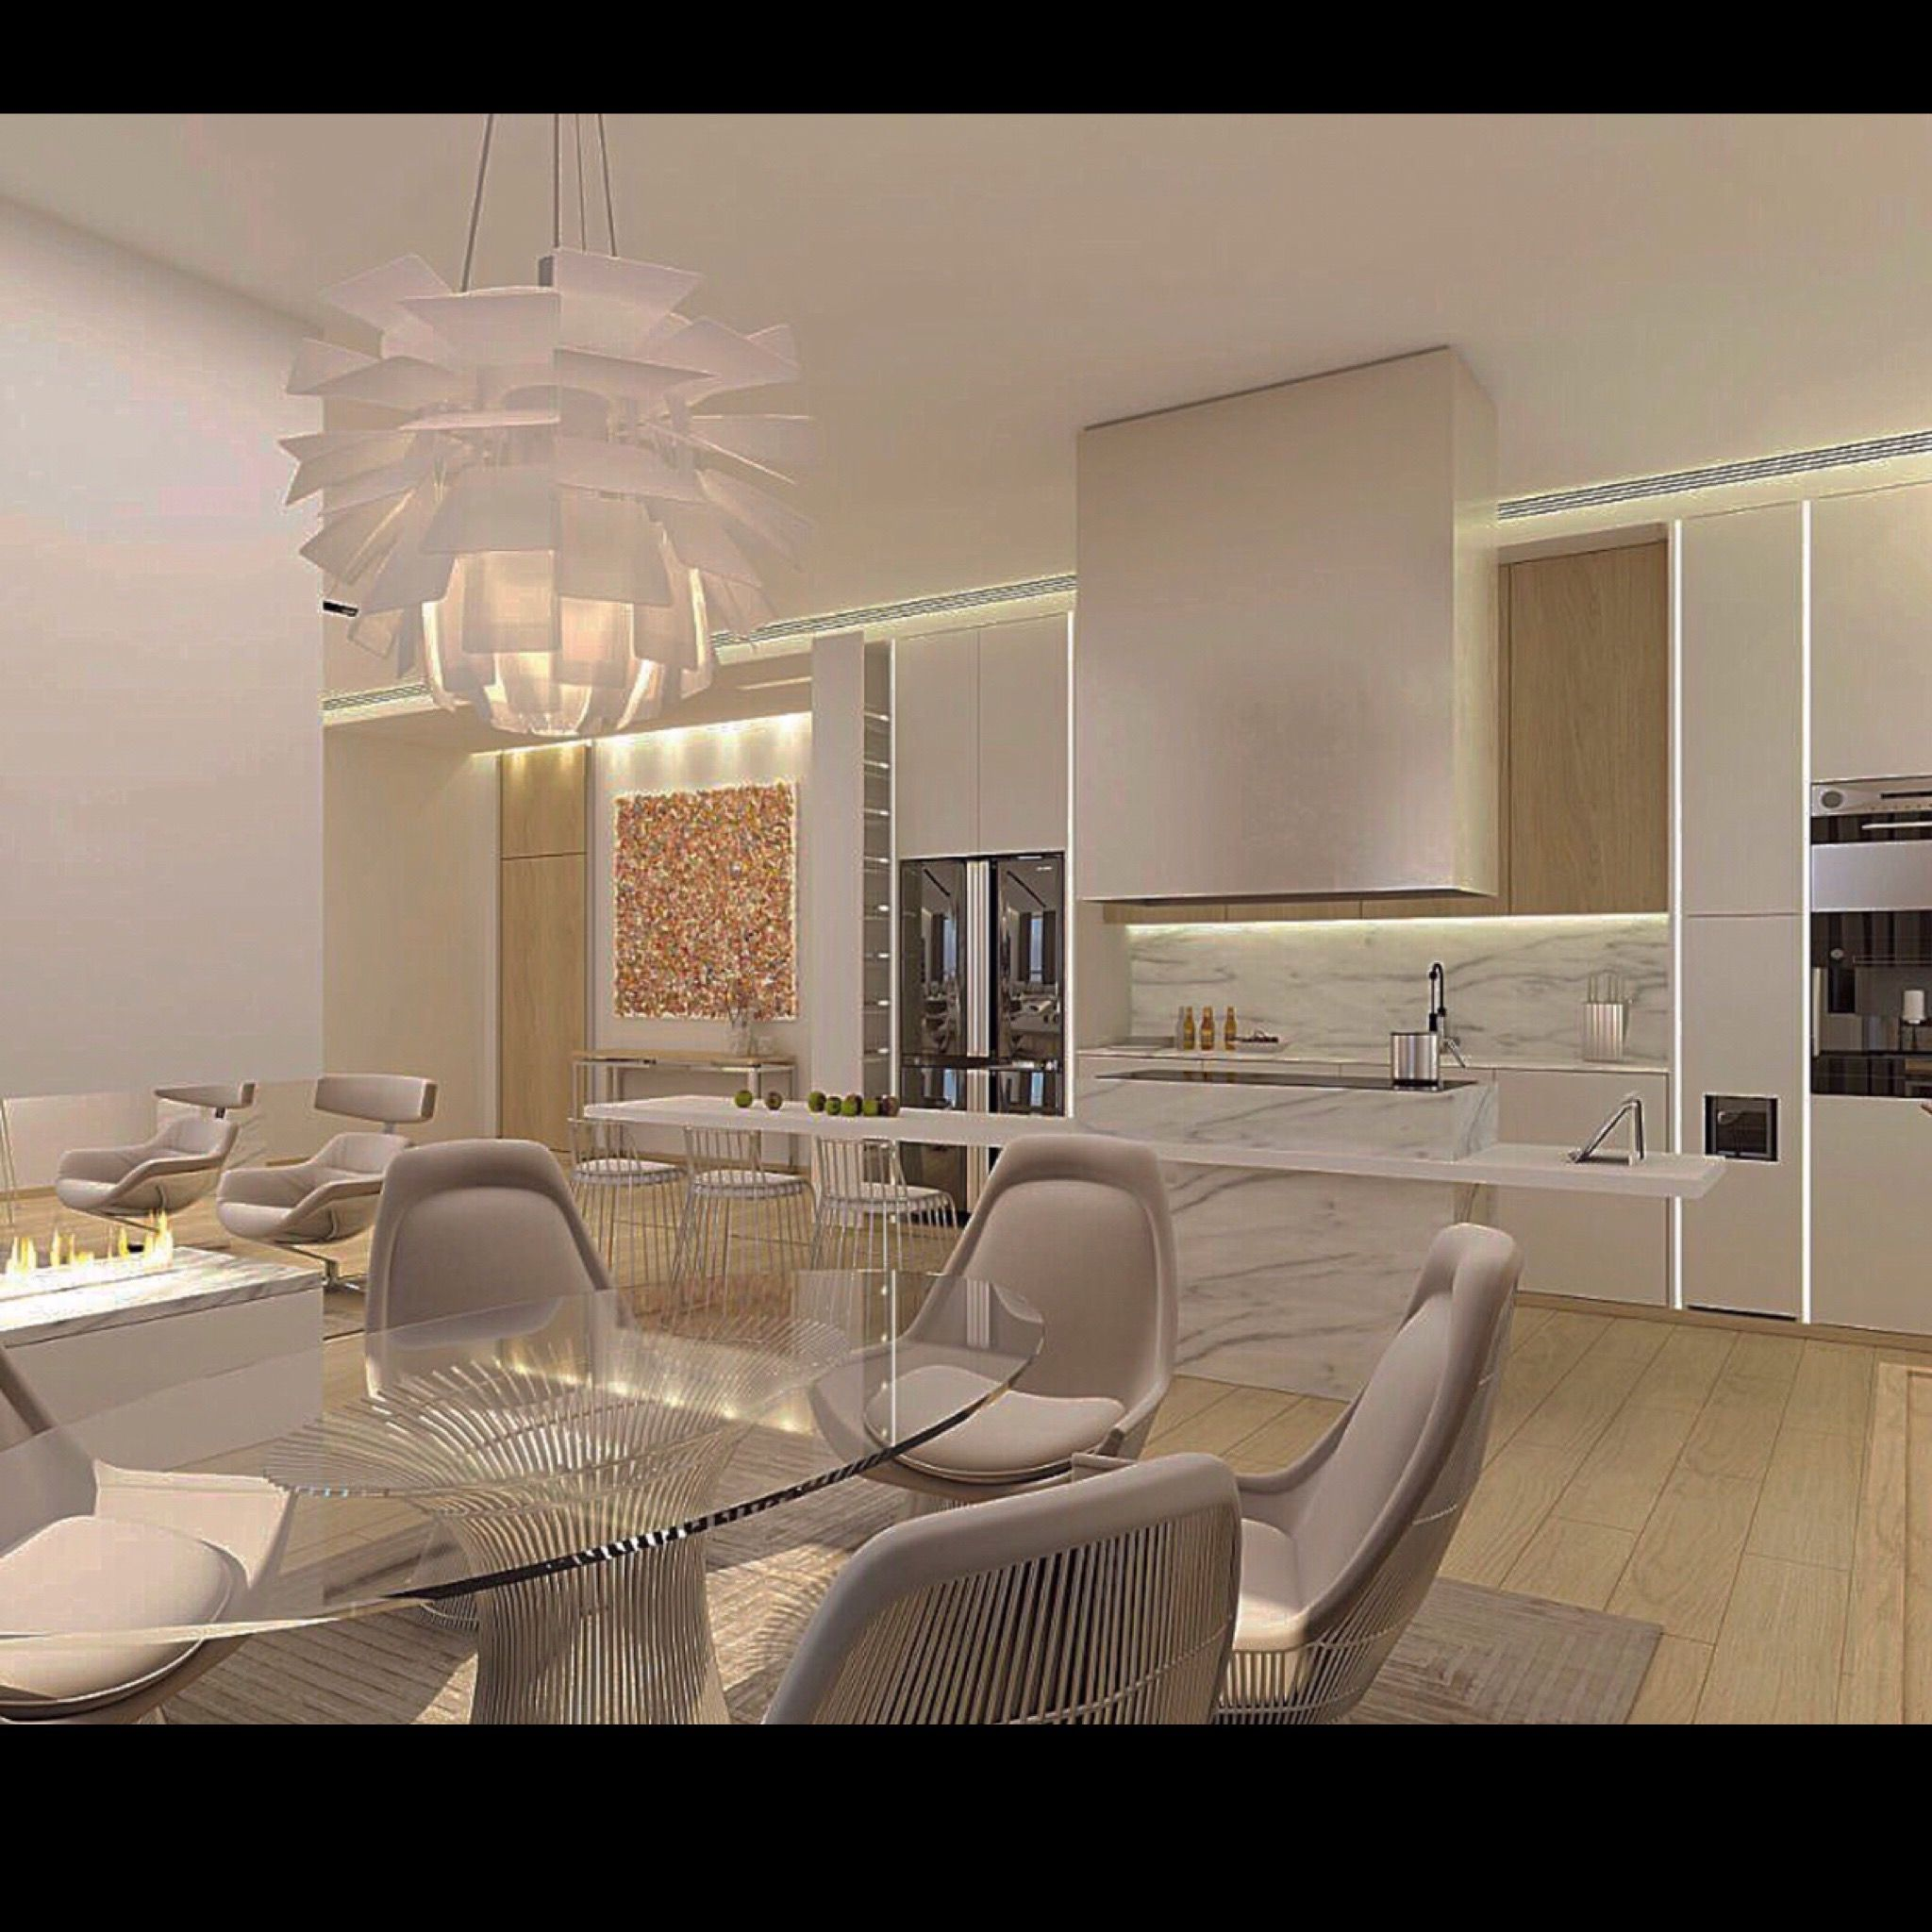 Modern room architectprojectinthemakingcomingsoonluxluxurychic modernhighenddesignnewyork paris londondesigner kuwaitmodern